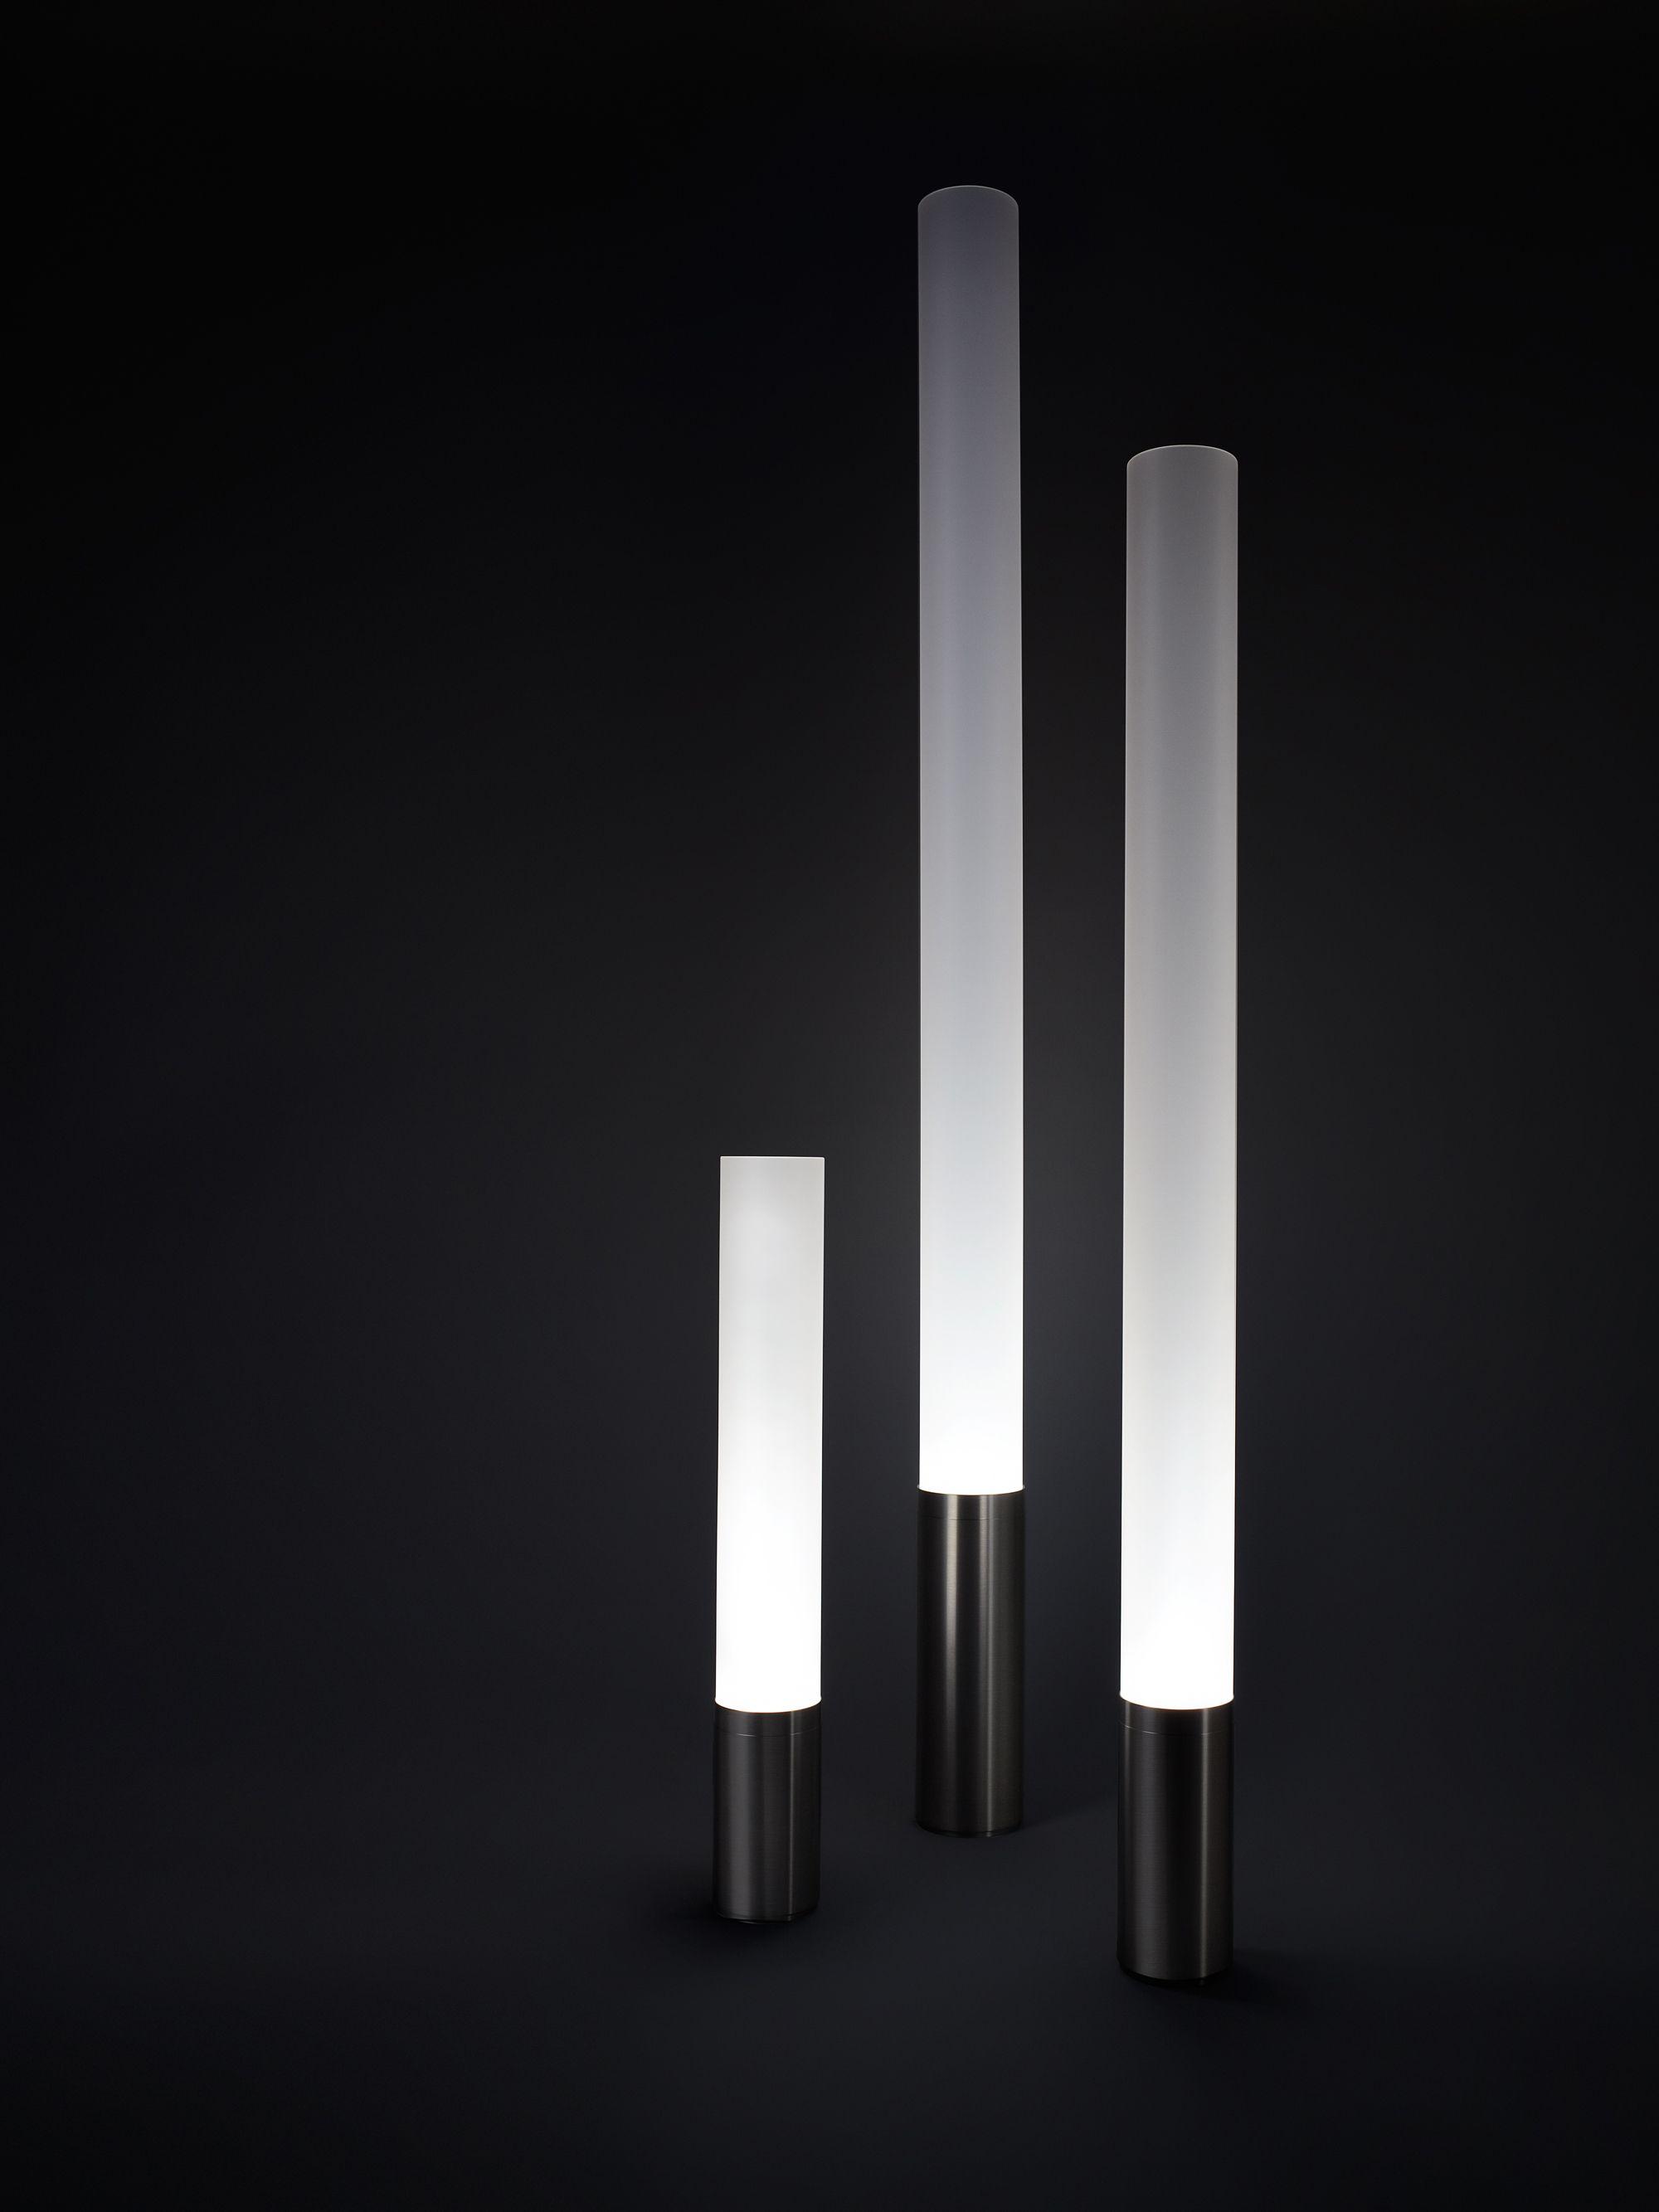 Really cool modern floor lamps, from 1-7 feet, $110-$380. Candelabra bulbs.